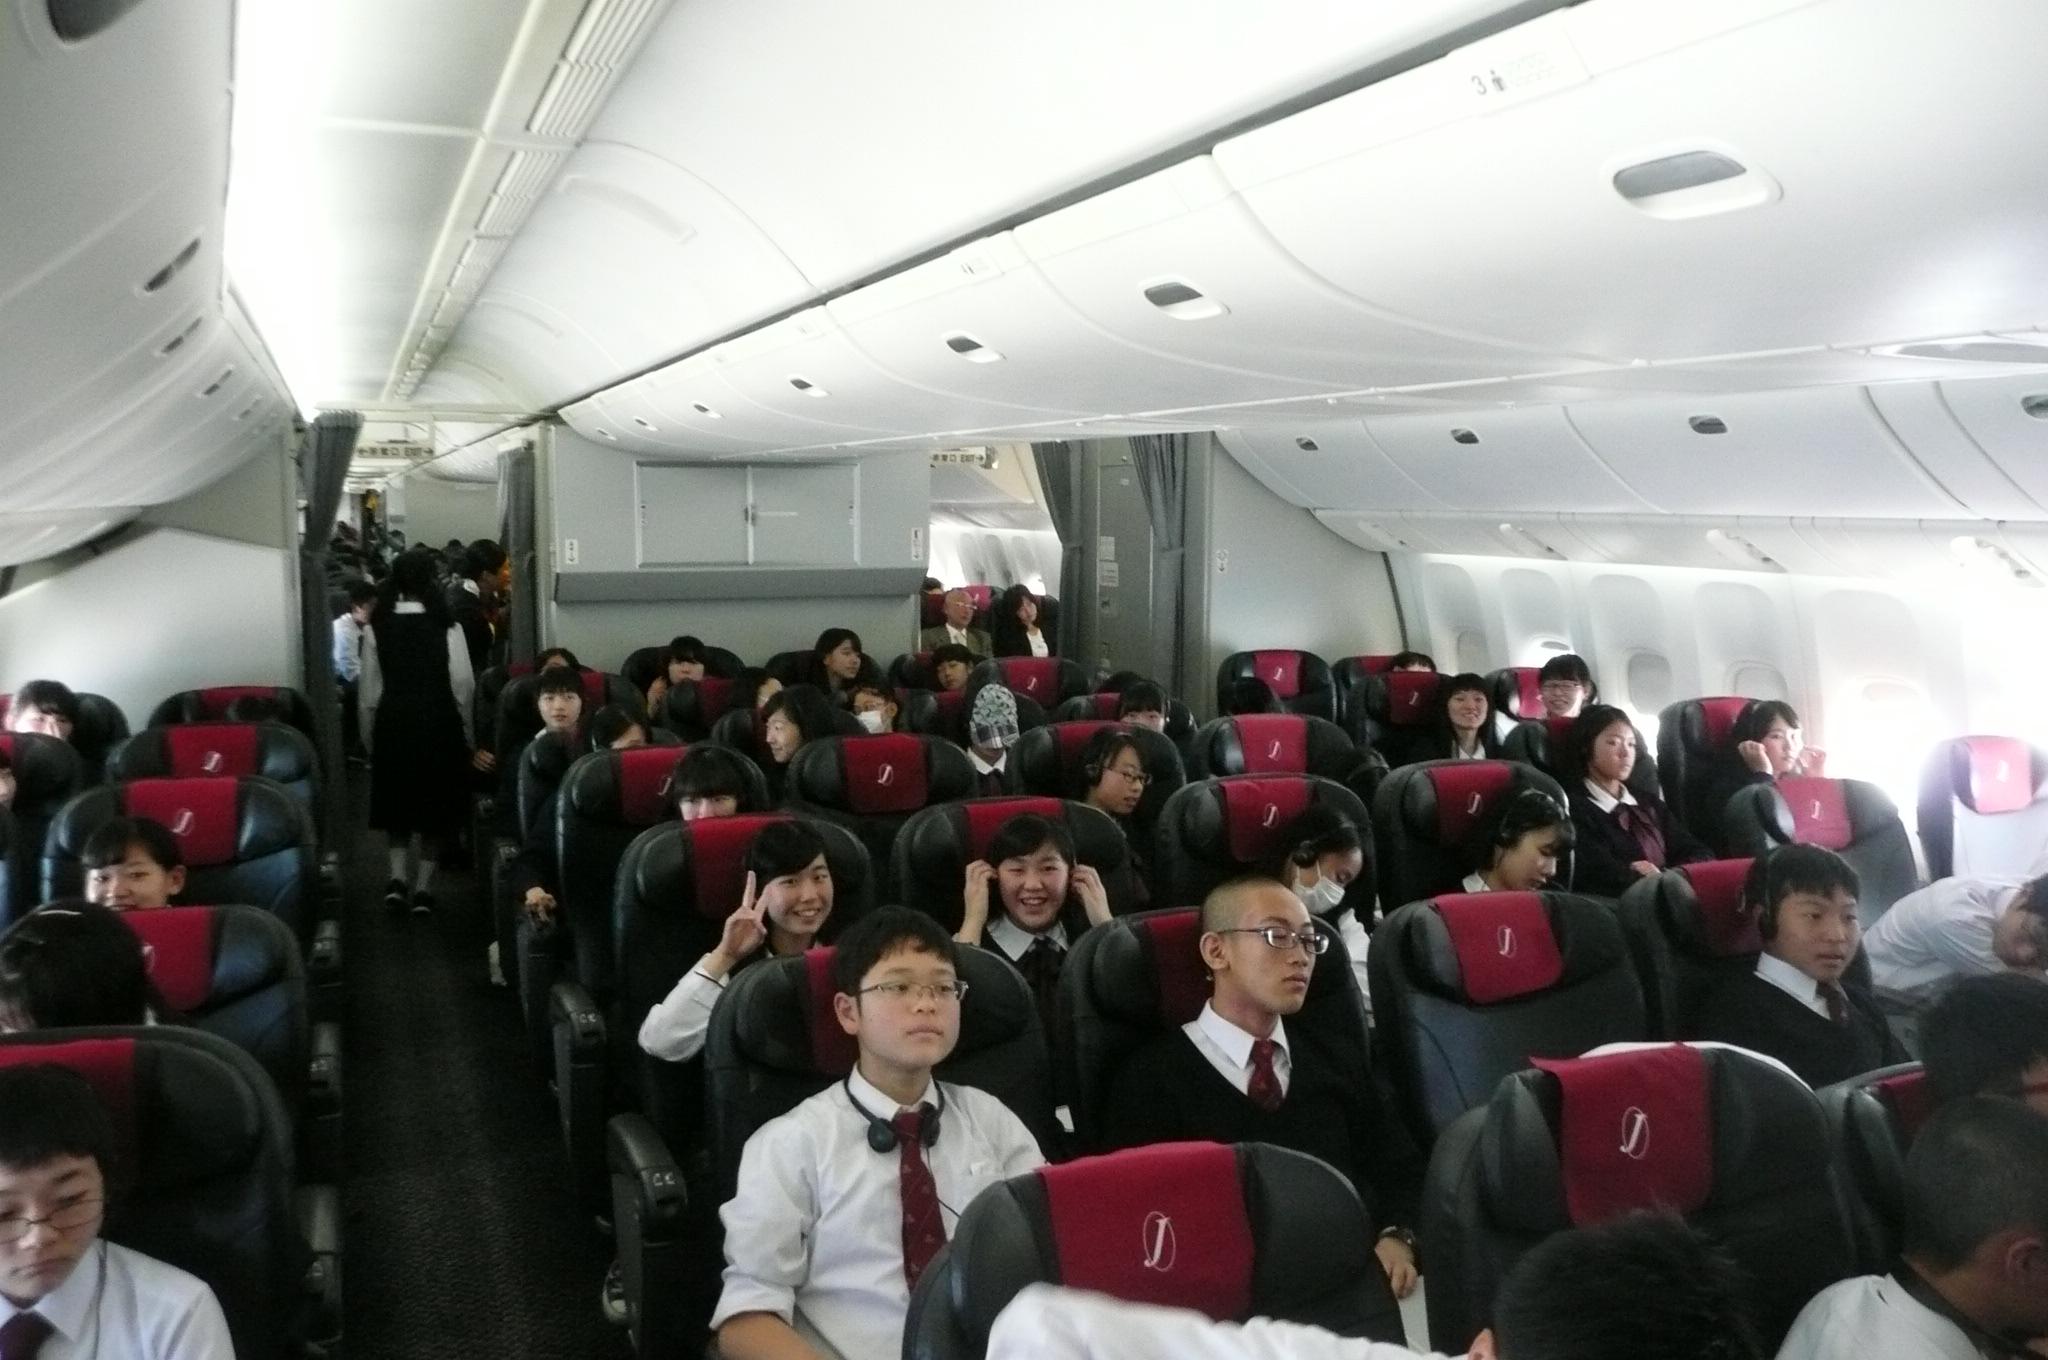 P1110089.JPG